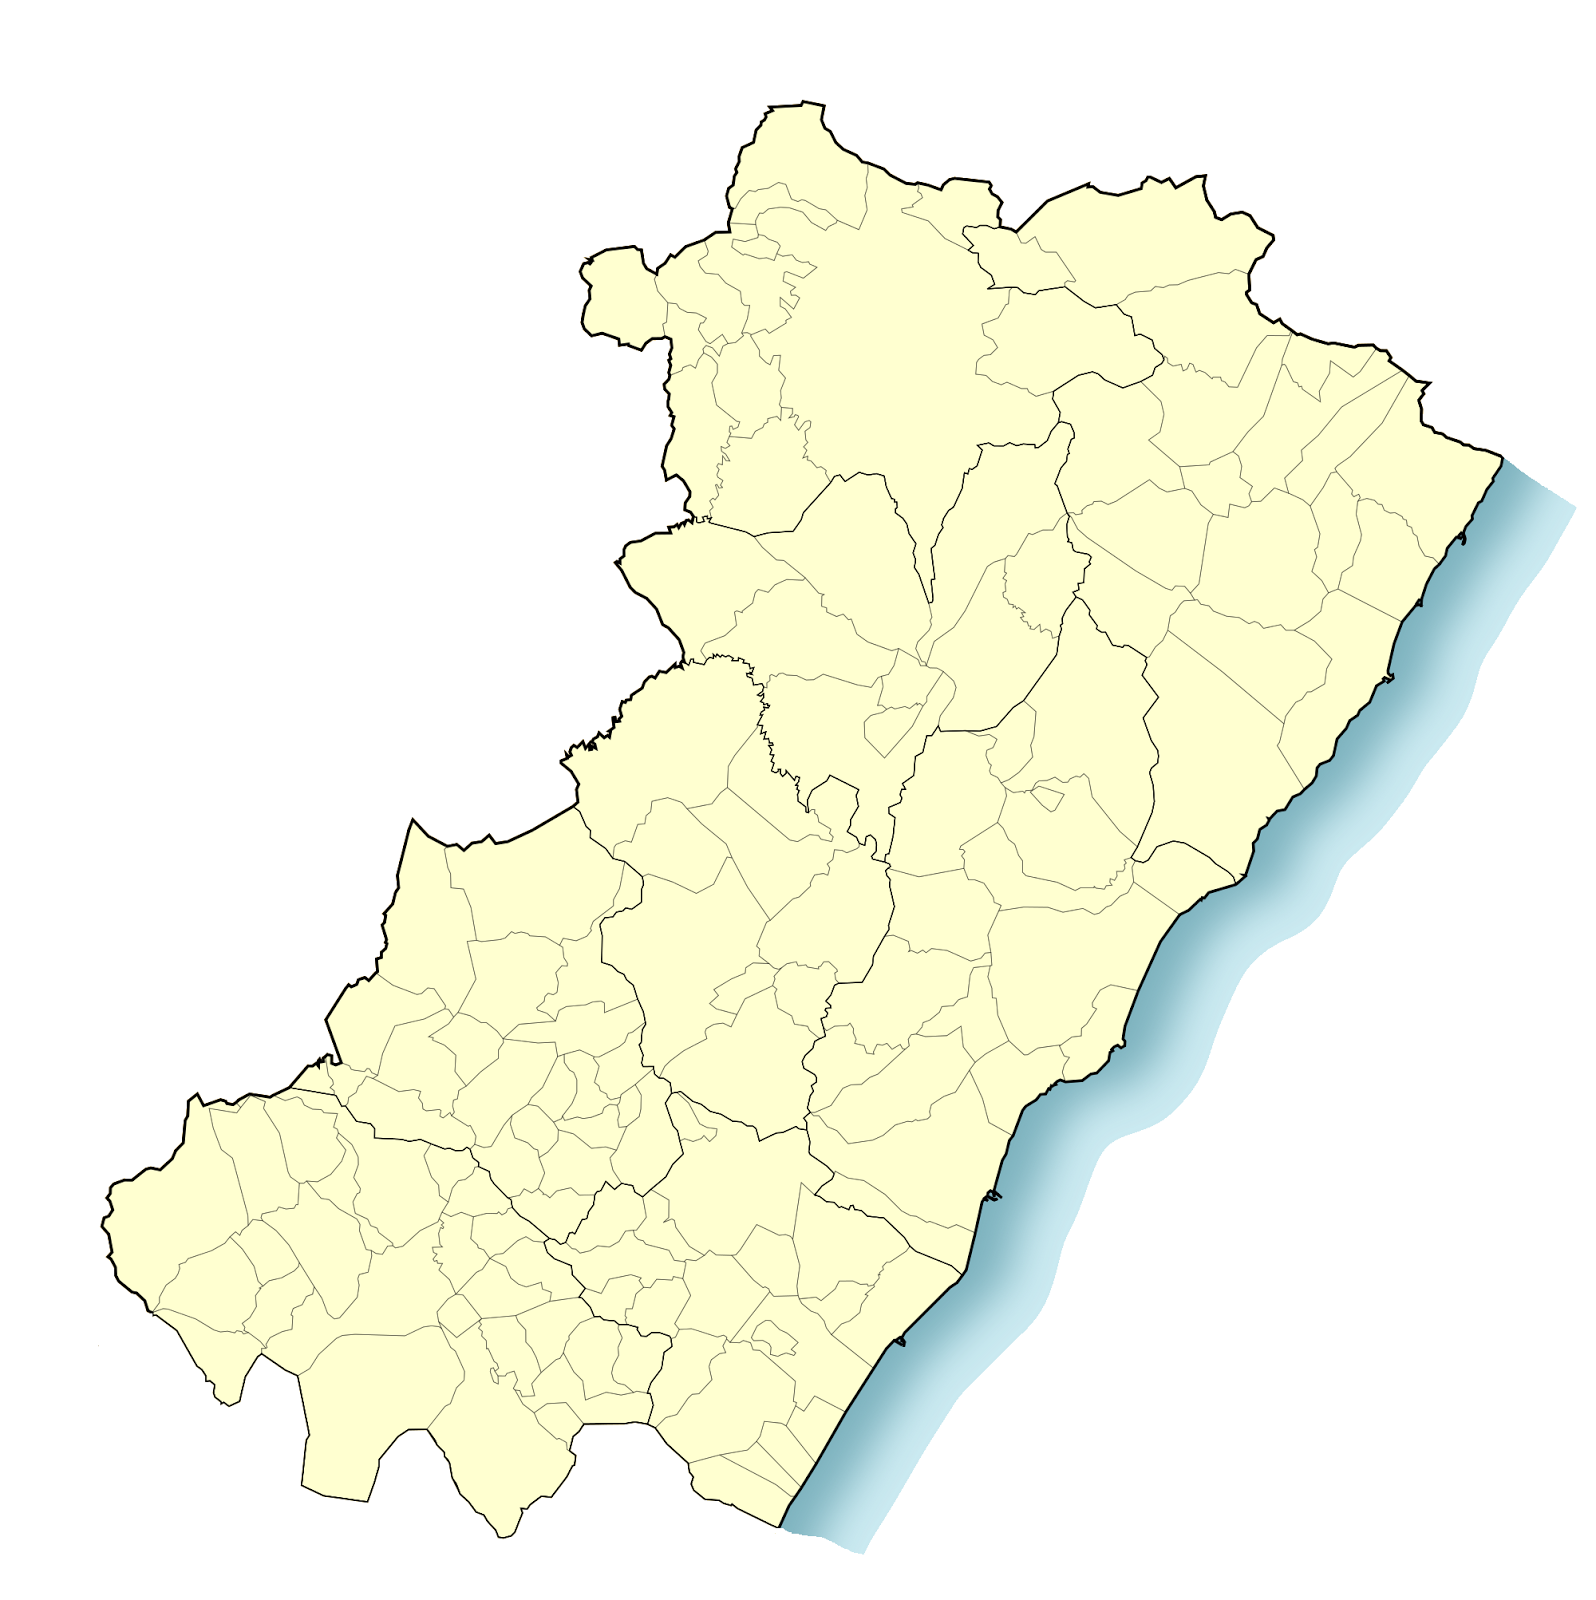 Mapa Provincia Castellon Municipios.Fusion De Municipios De Espana Abril 2013